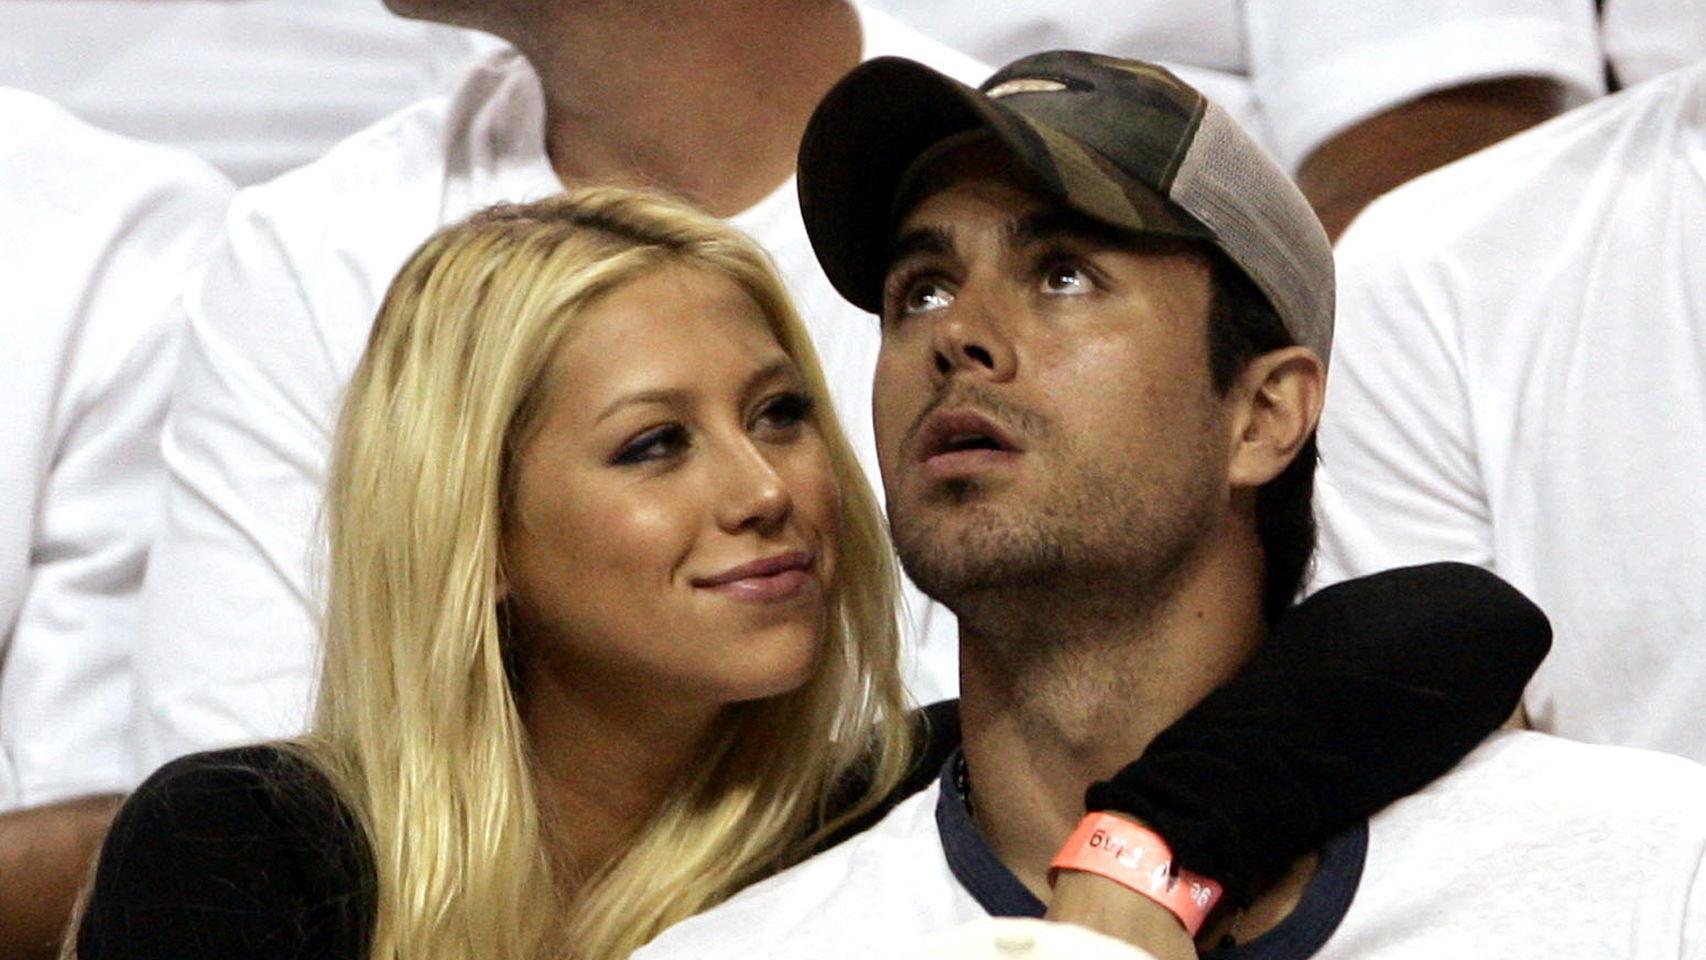 Anna Kournikova y Enrique Iglesias se convertirán en padres por tercera vez.